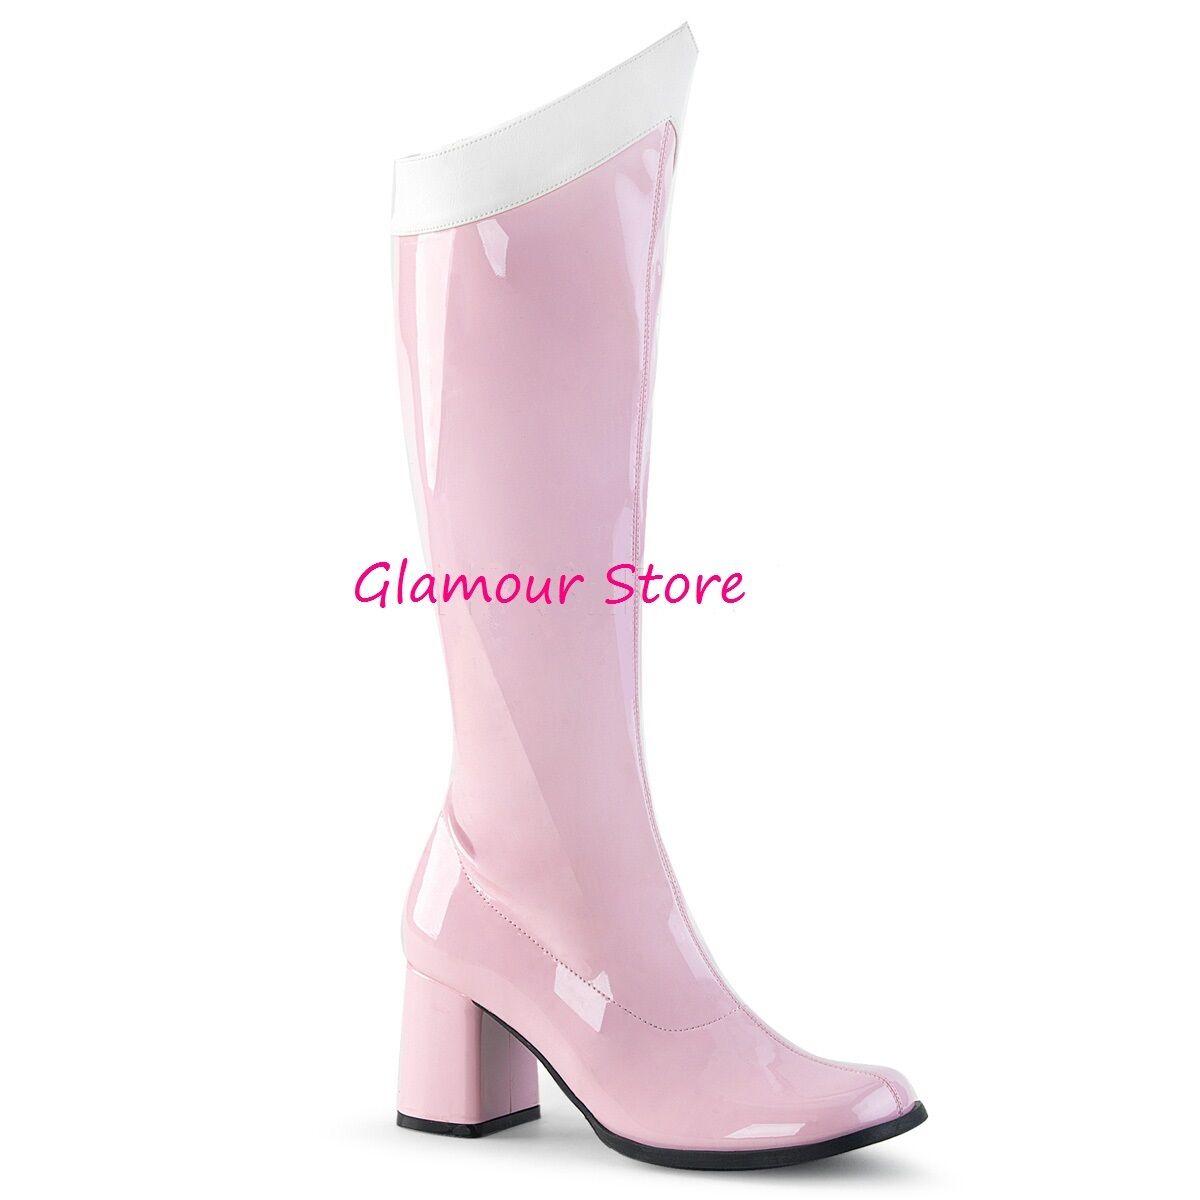 Sexy STIVALI tacco 7,5 ROSA/BIANCO dal 35 al 41 zip scarpe COSPLAY glamour